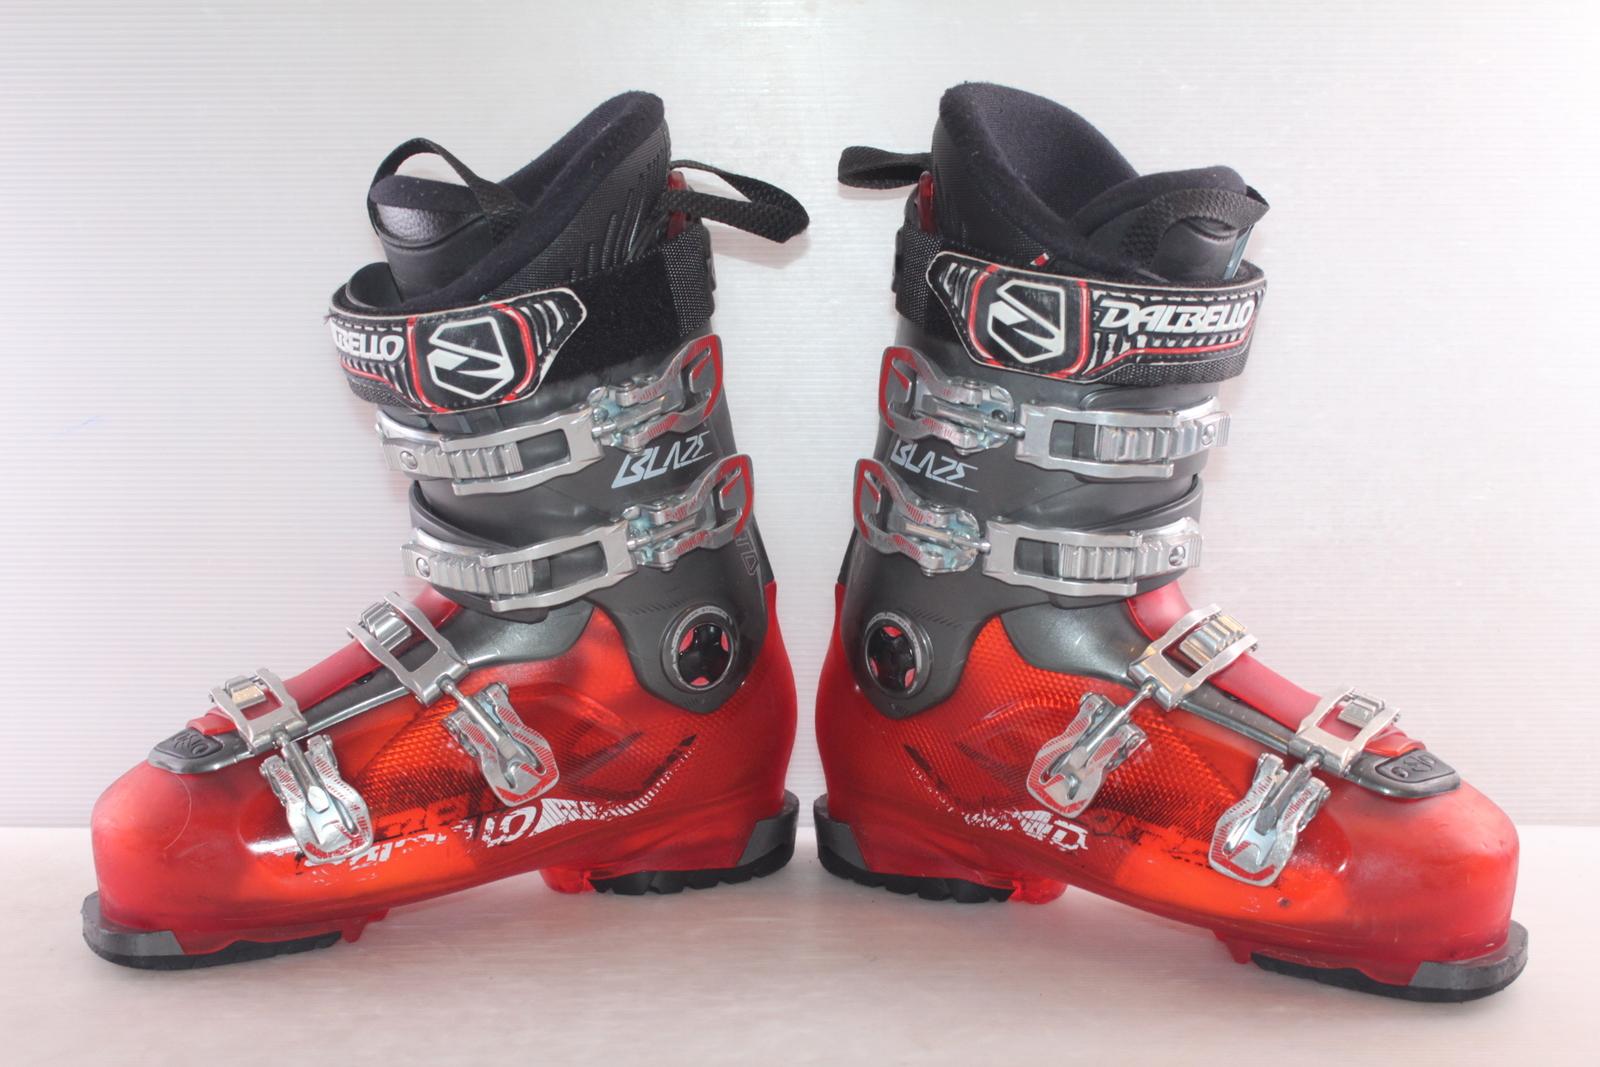 Lyžařské boty Dalbello Blaze Ltd vel. EU43 flexe 80